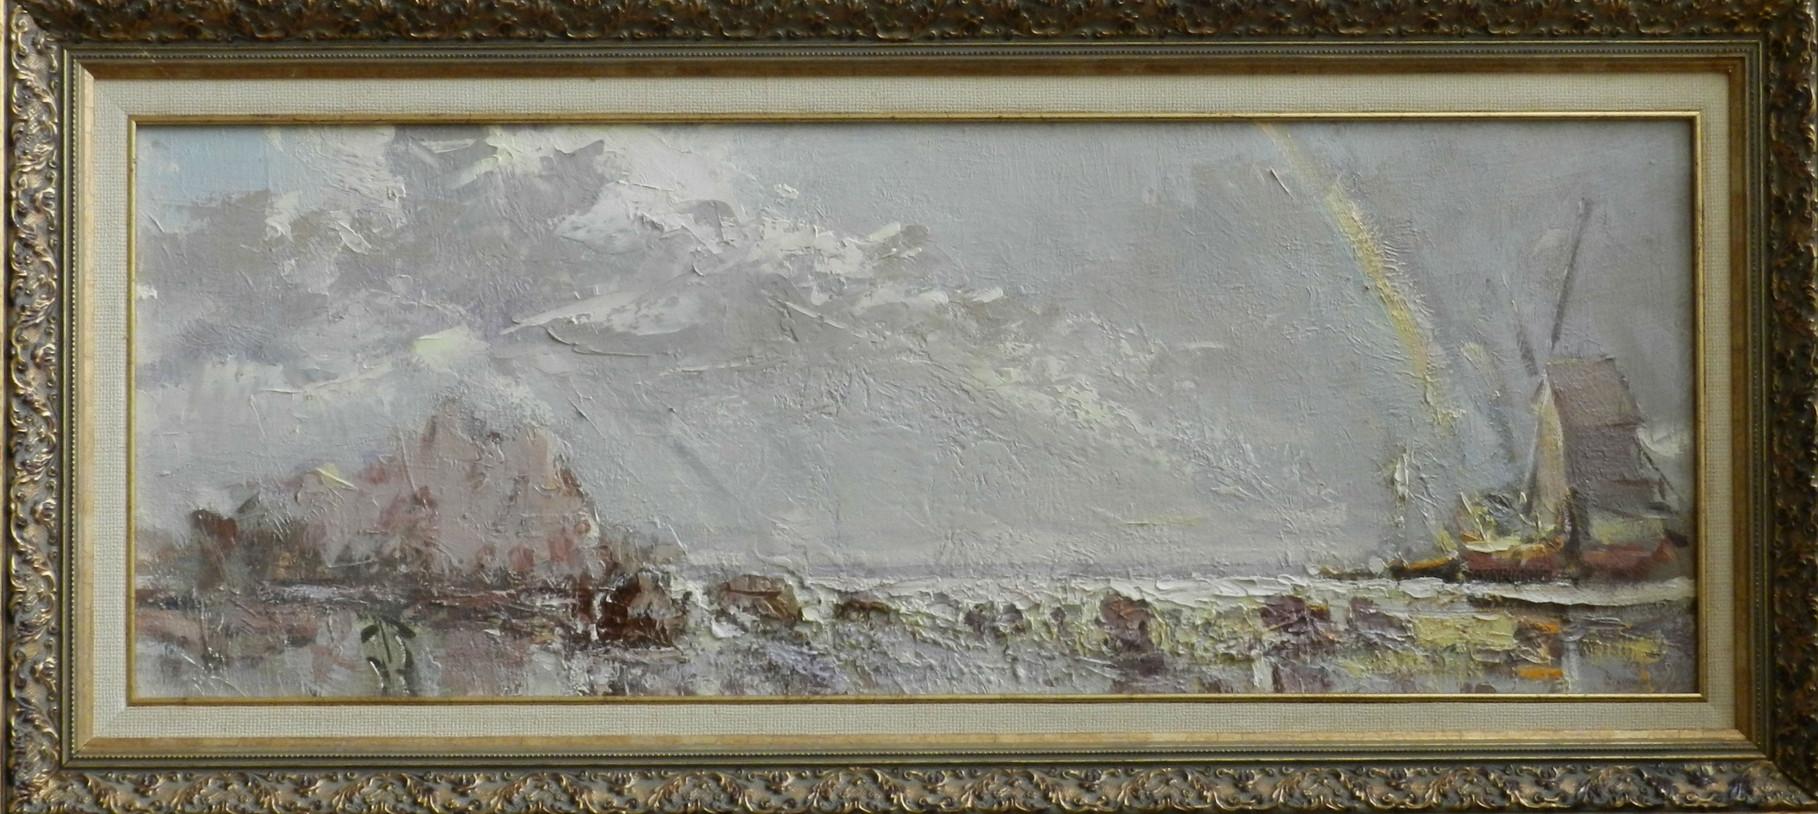 Скалистый берег Монте Негро.           2006 г.       Холст, масло.   33х88 см.